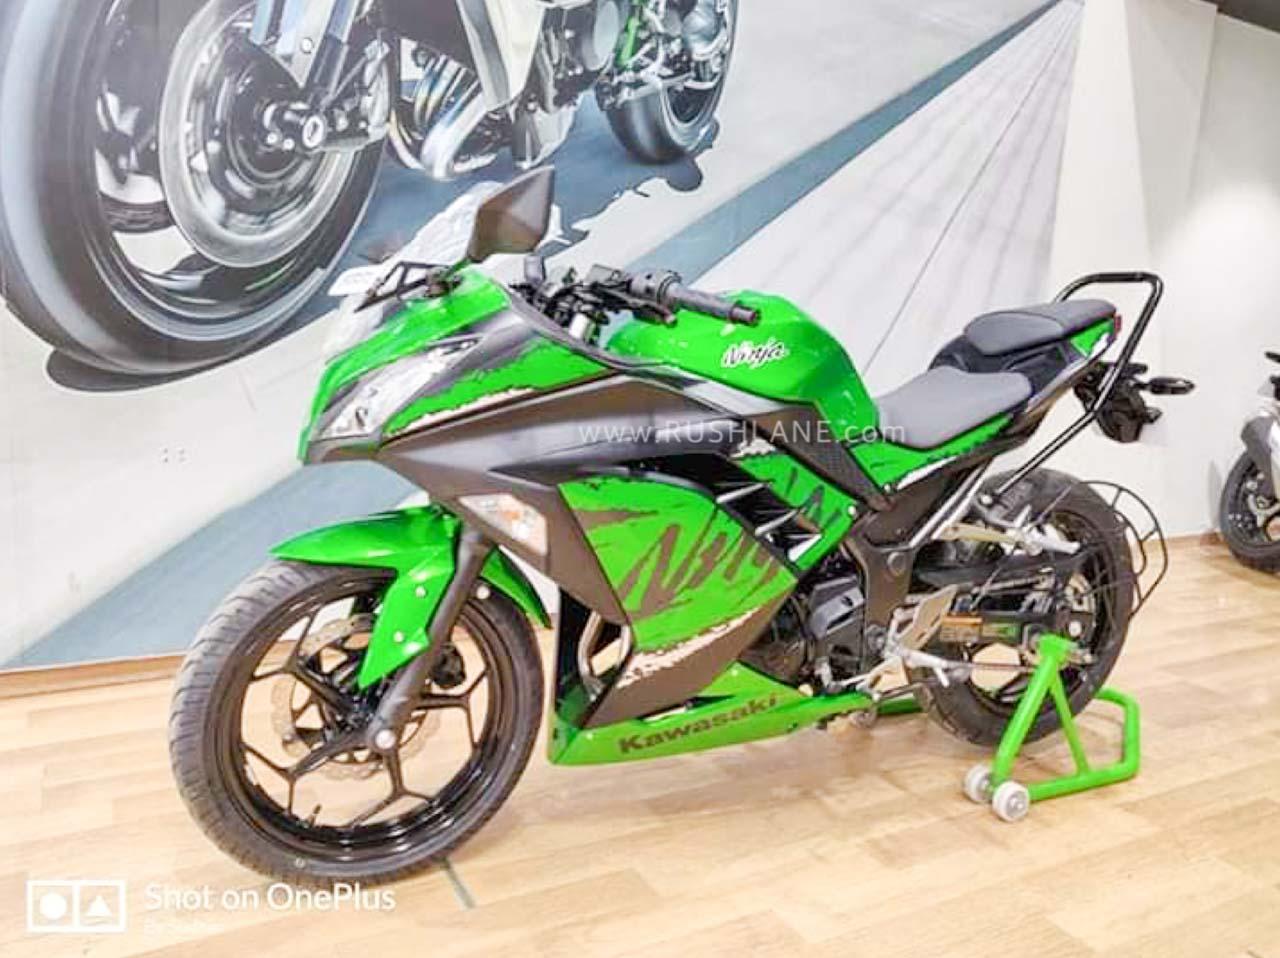 Kawasaki Ninja 300 discontinued